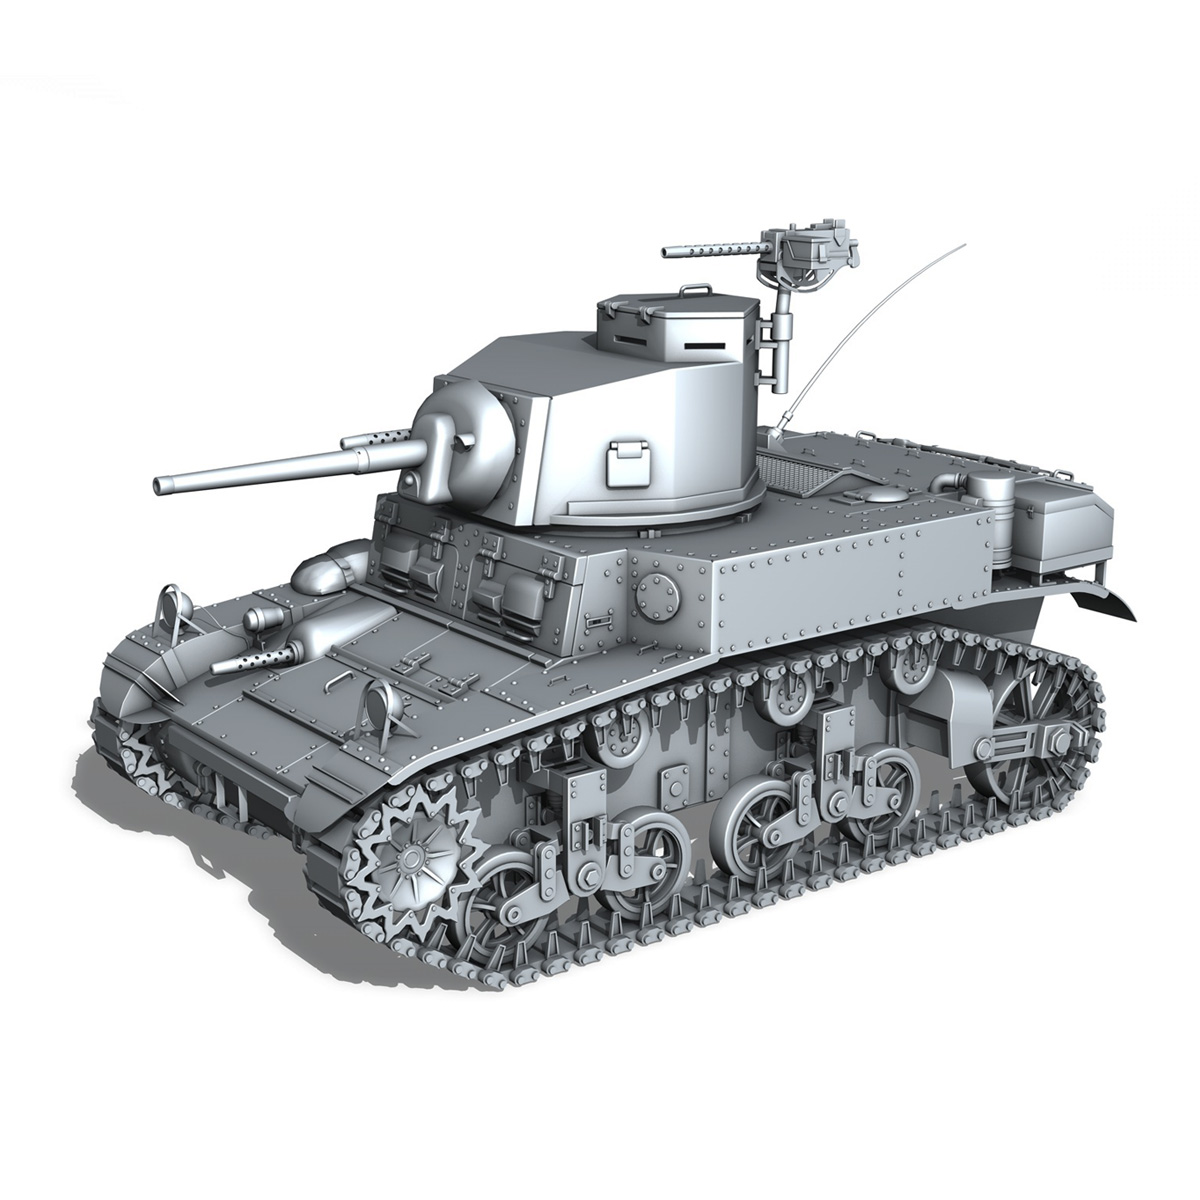 m3 light tank stuart – early production 3d model 3ds fbx c4d lwo obj 189171